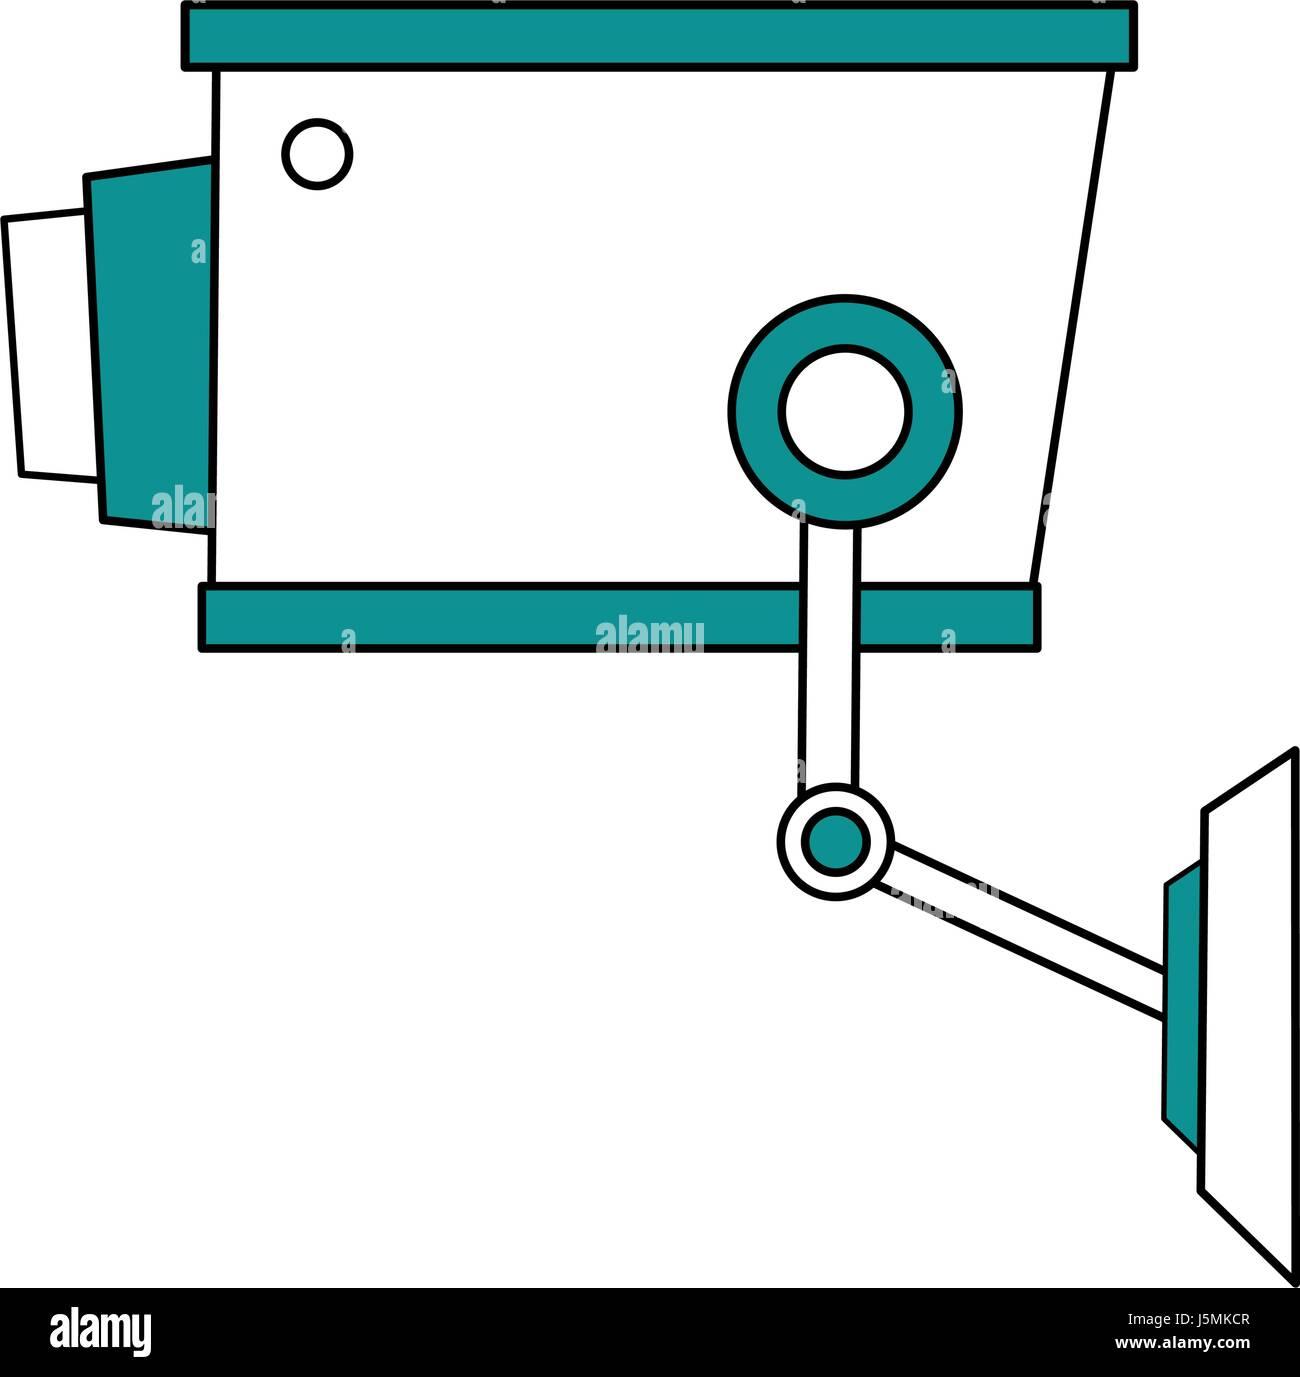 color silhouette image infrared surveillance camera icon Stock Vector